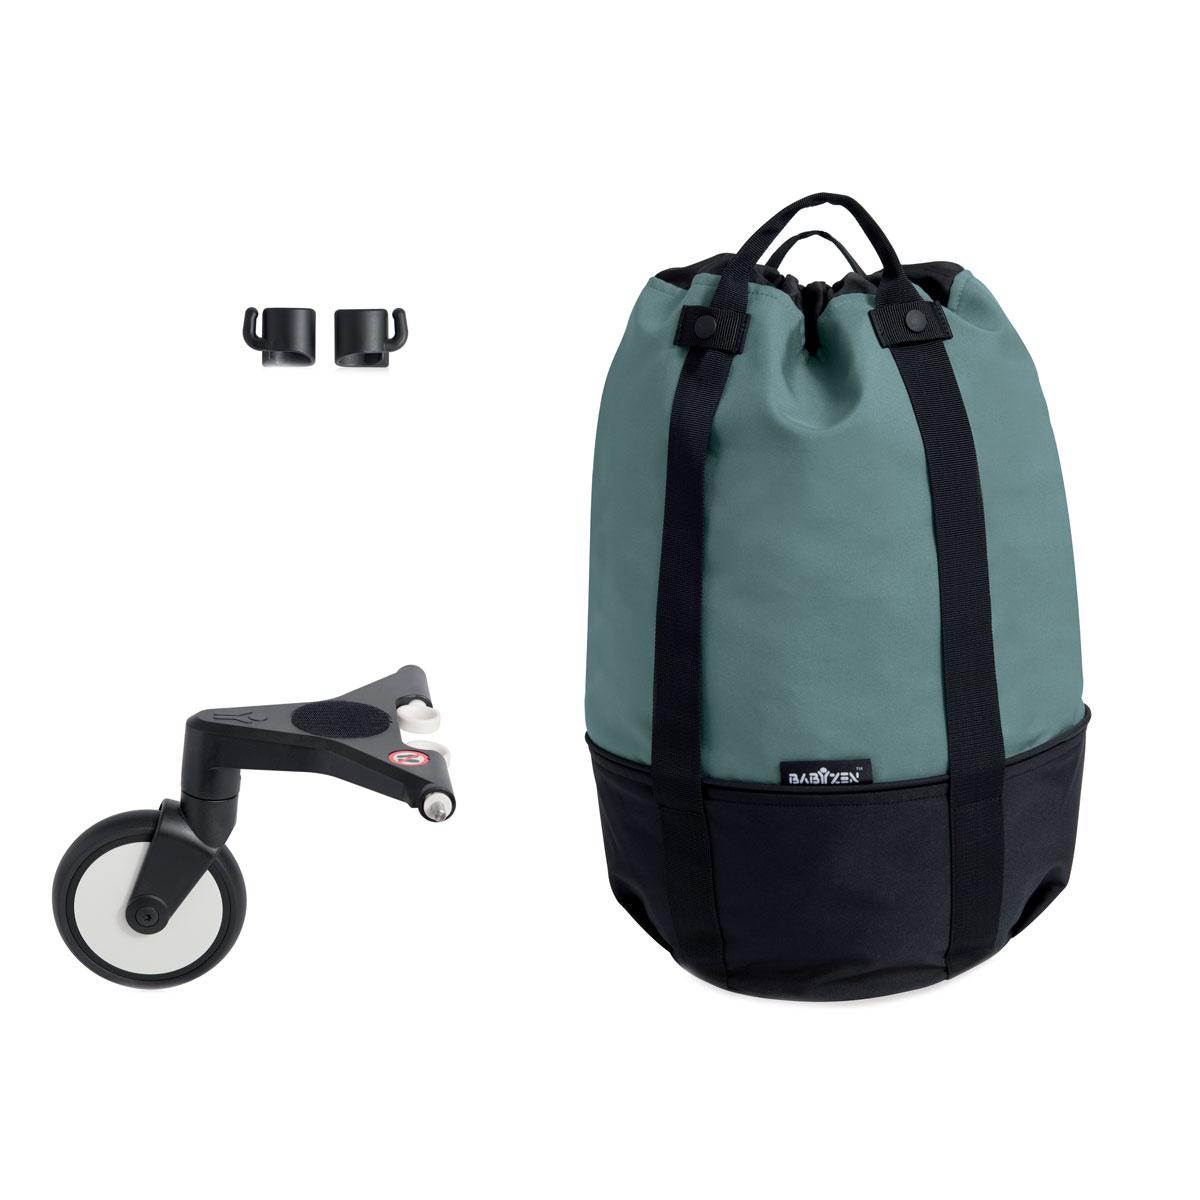 Sac Yoyo+ bag